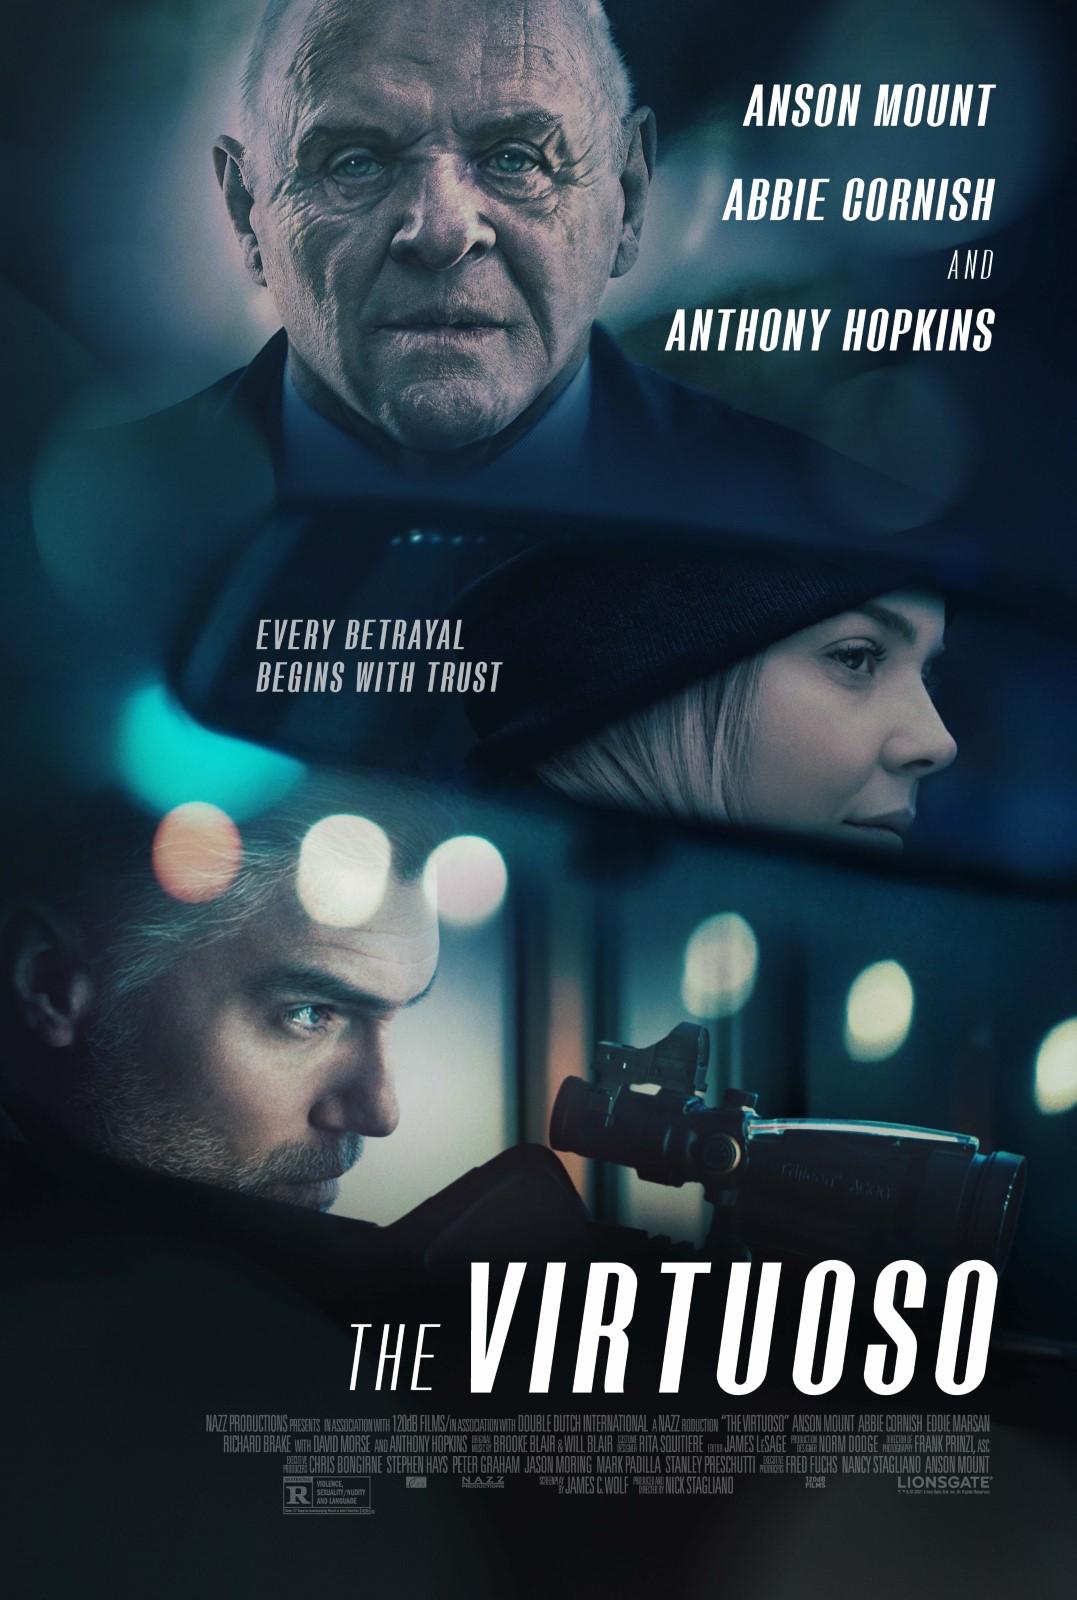 The Virtuoso poster - Foto 1 - AdoroCinema